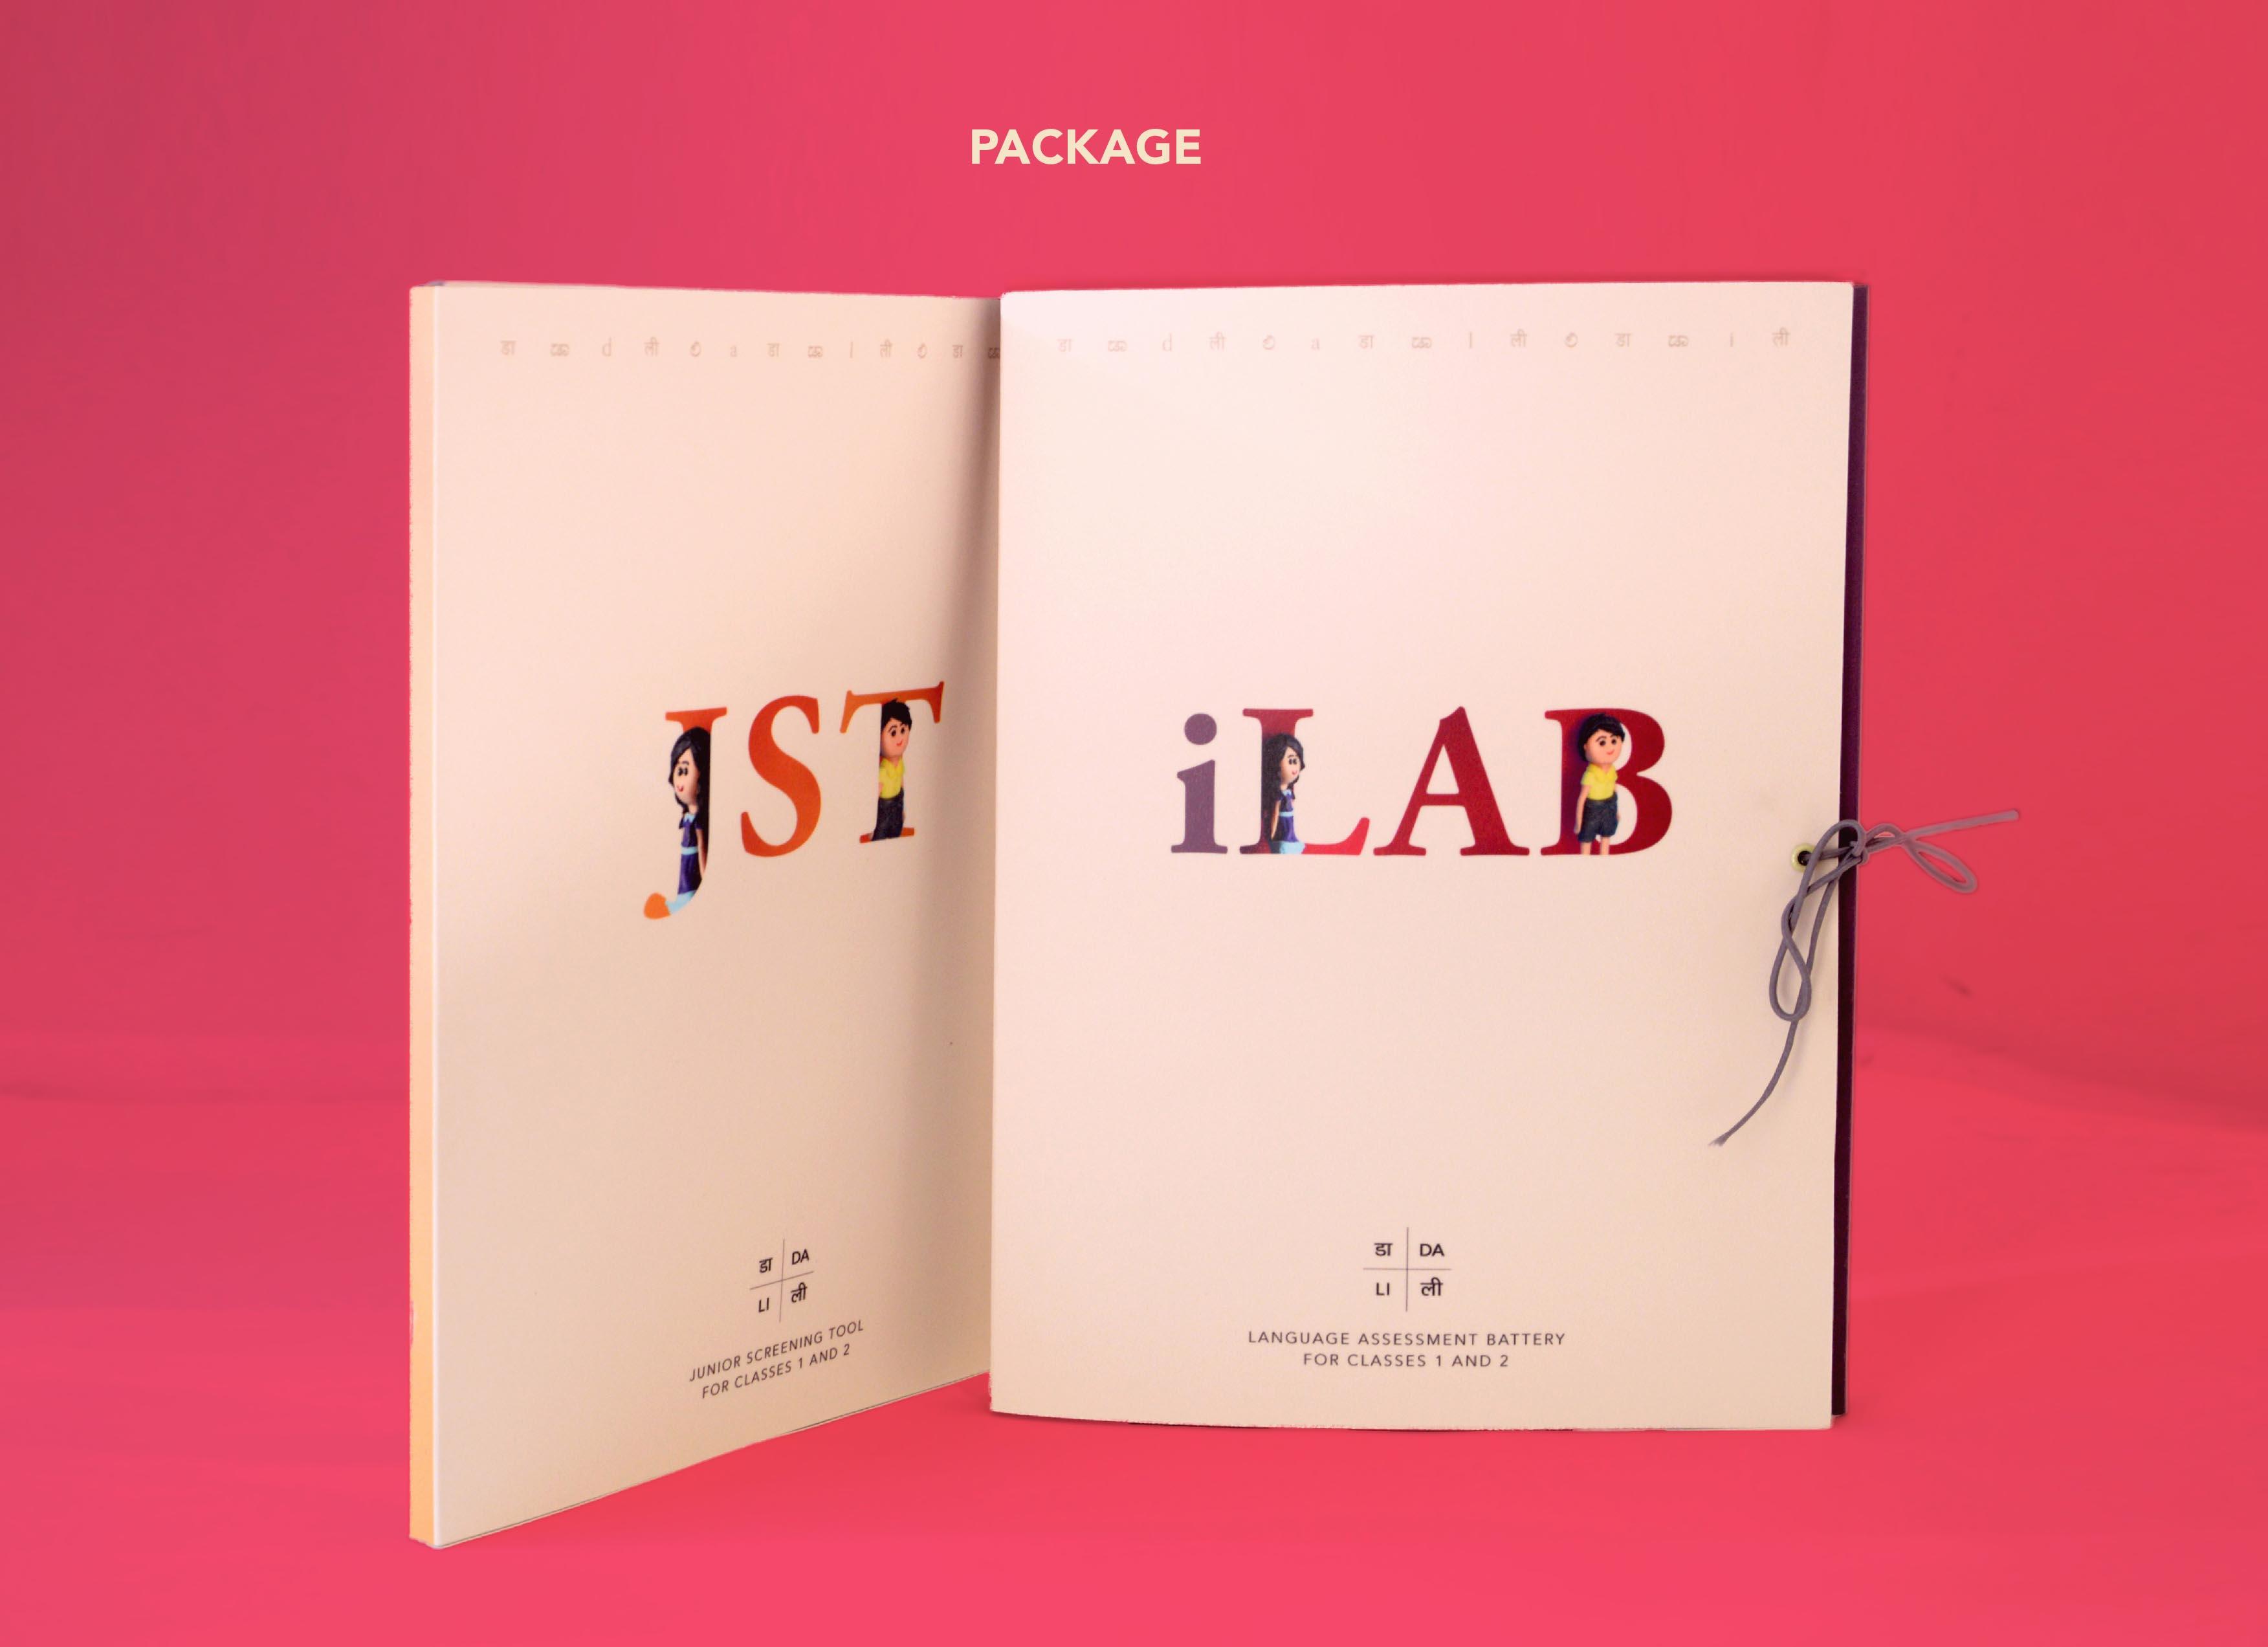 Final Package